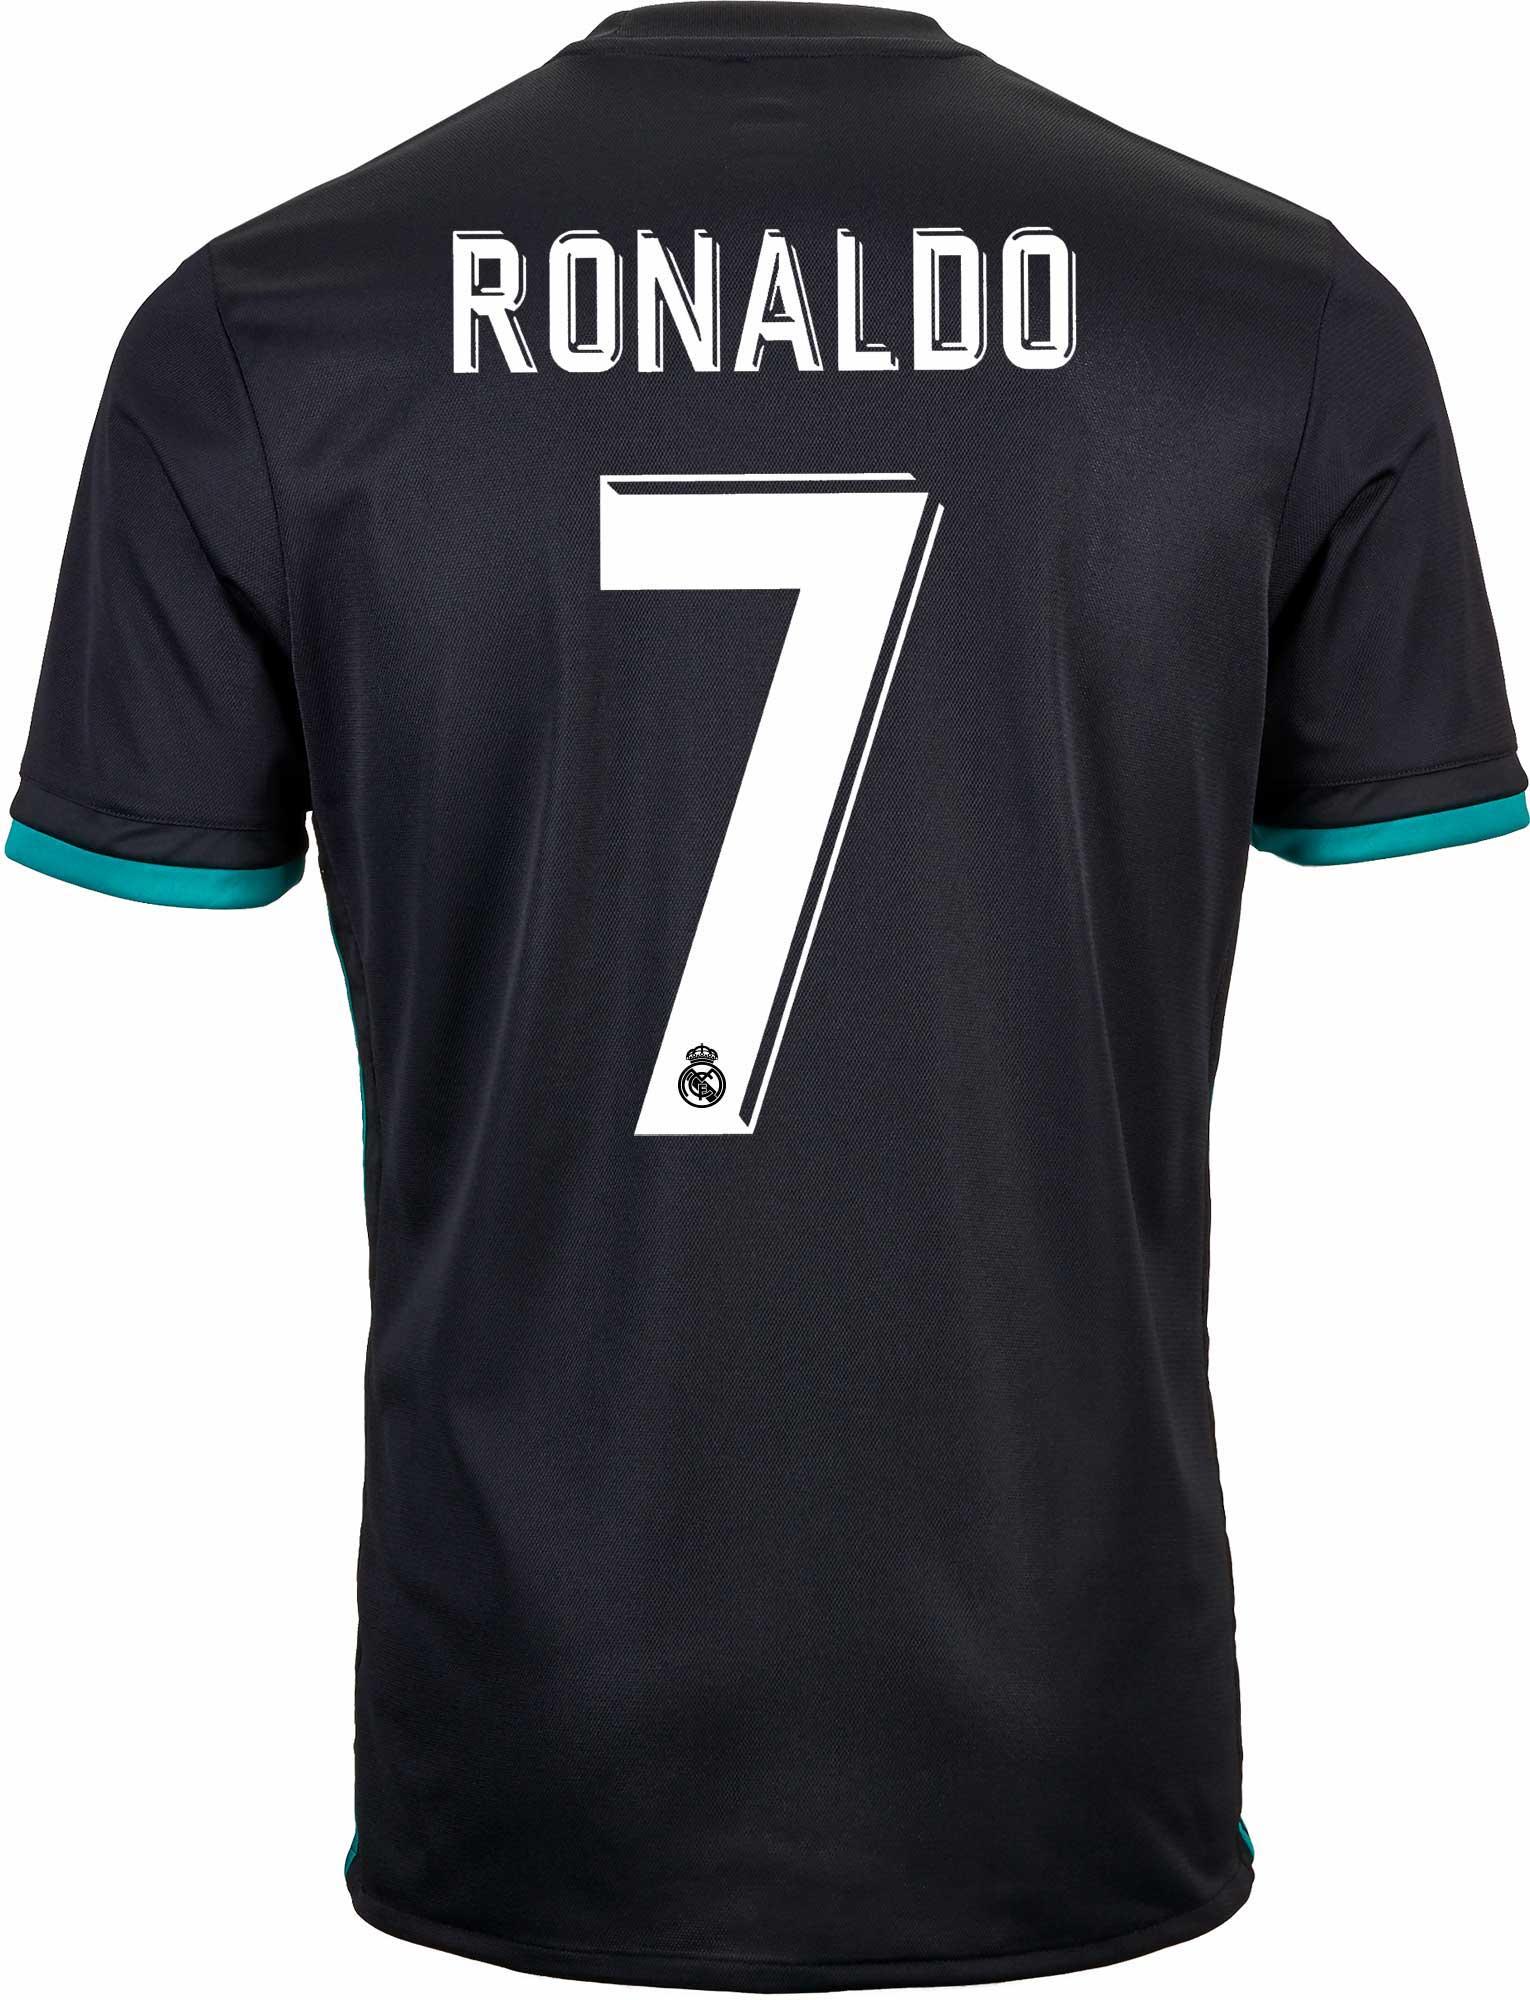 2017 18 adidas Kids Cristiano Ronaldo Real Madrid Away Jersey ... 9157bc76a